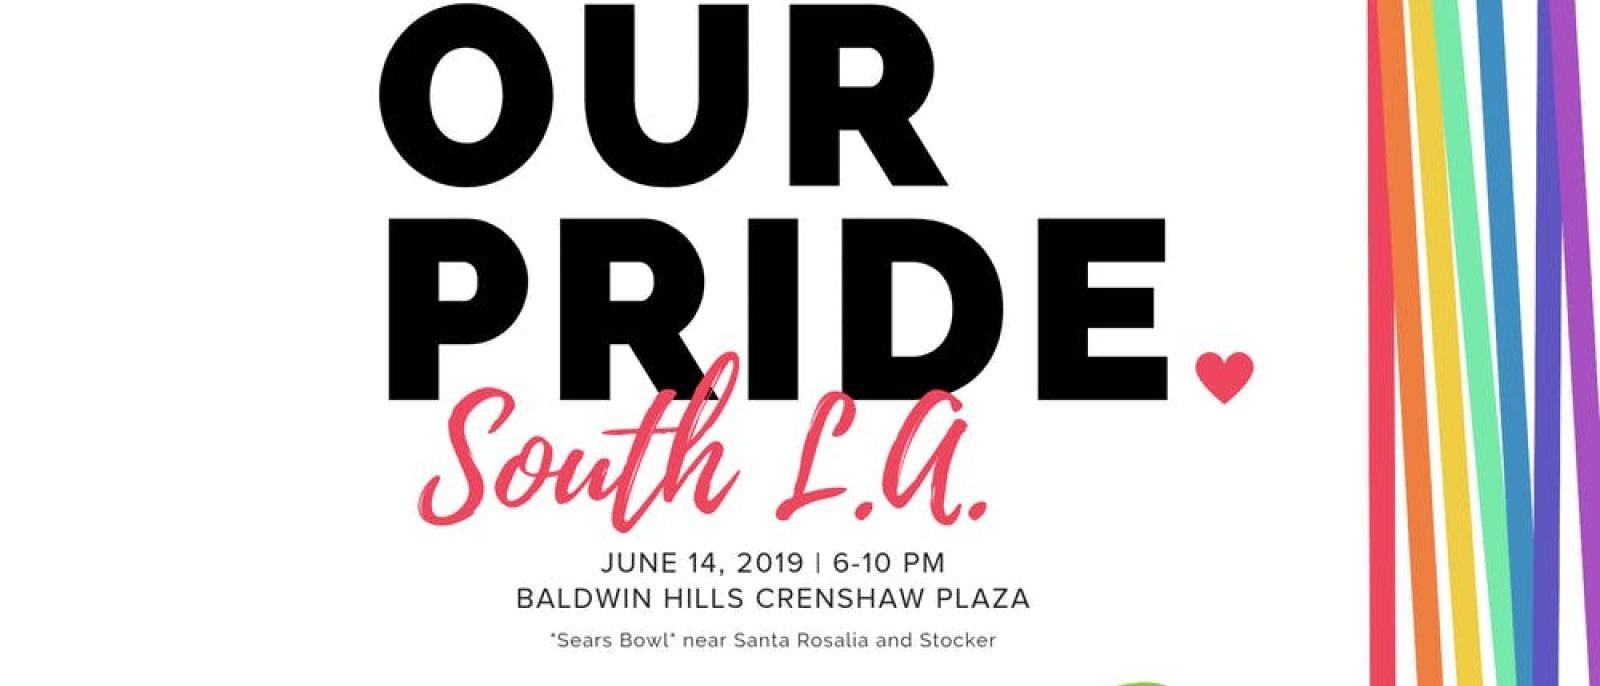 Our Pride South LA 2019 at Baldwin Hills Crenshaw Plaza